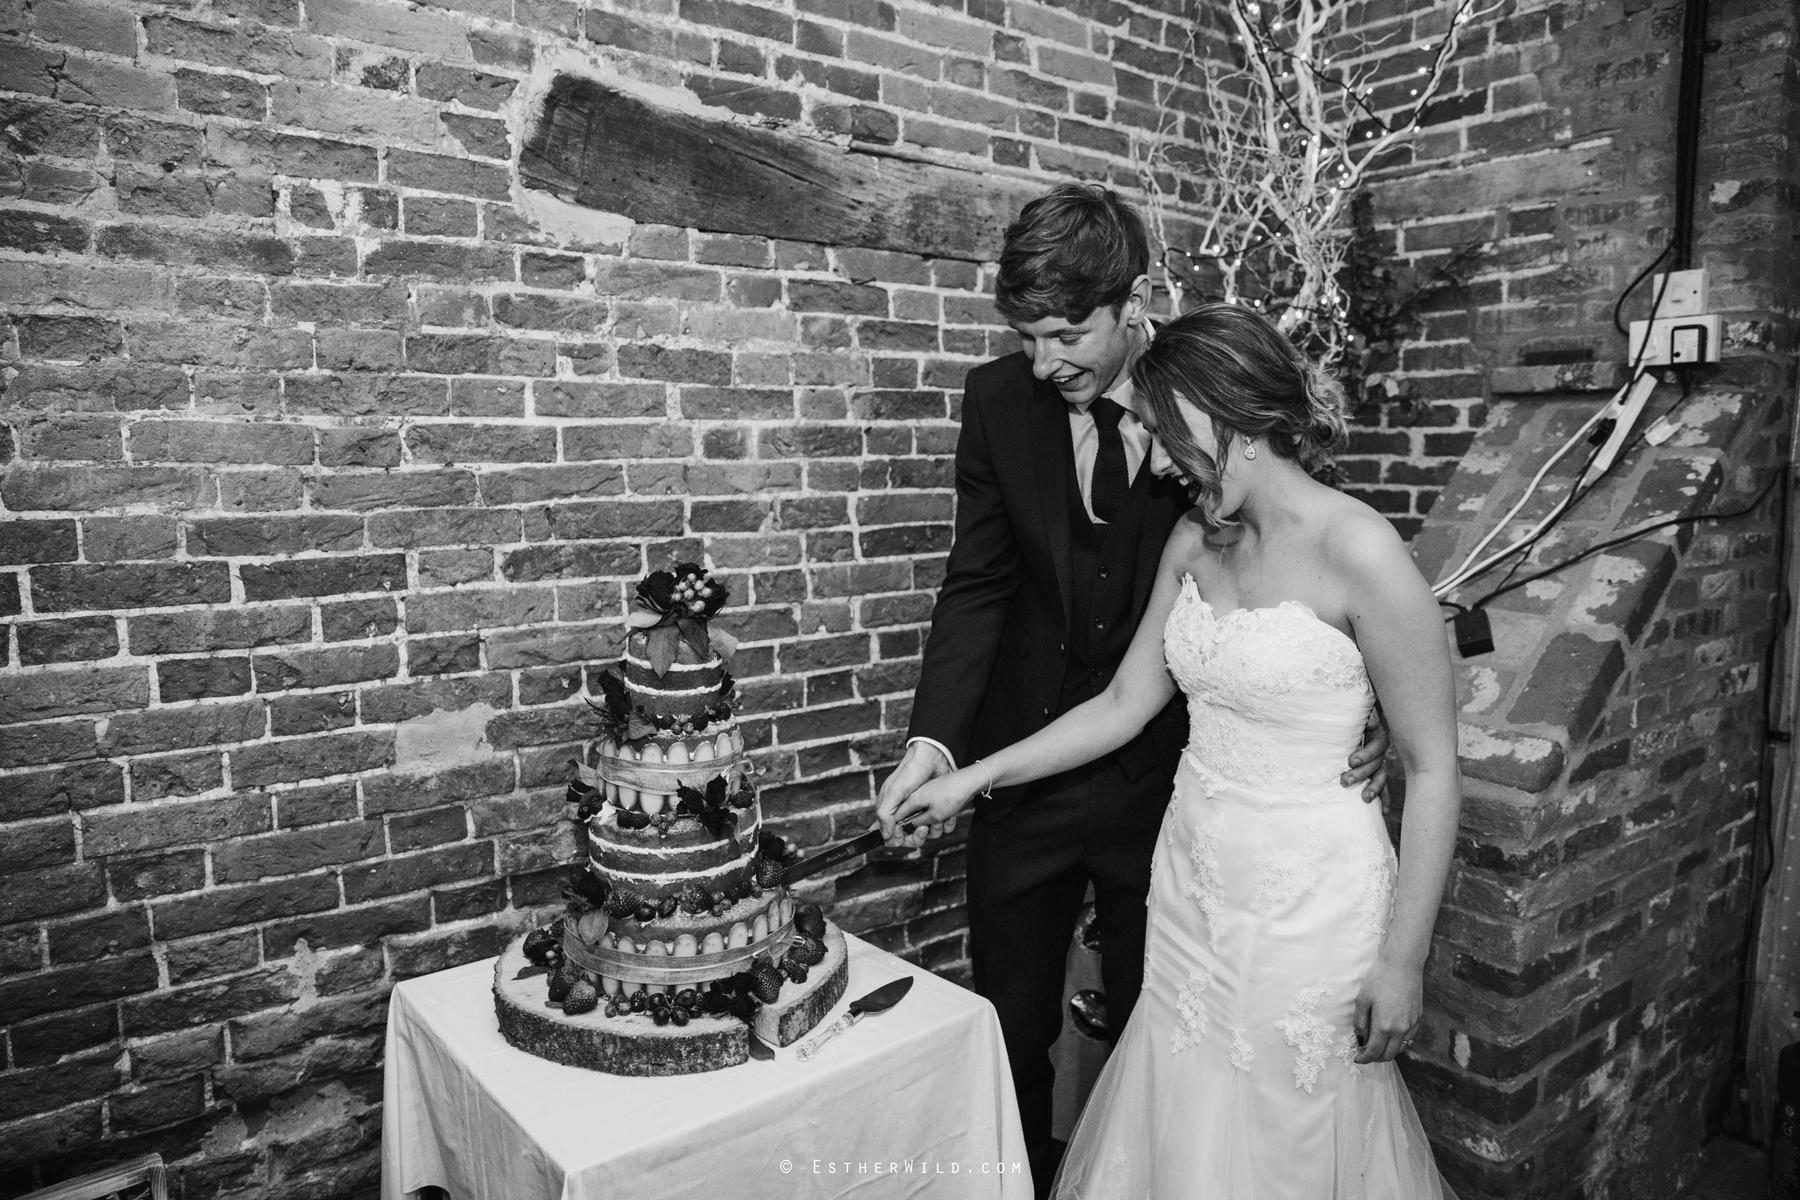 Glebe_Farm_Barn_Rustic_Norfolk_Wedding_Esther_Wild_Photographer_Copyright_IMG_2780-1.jpg